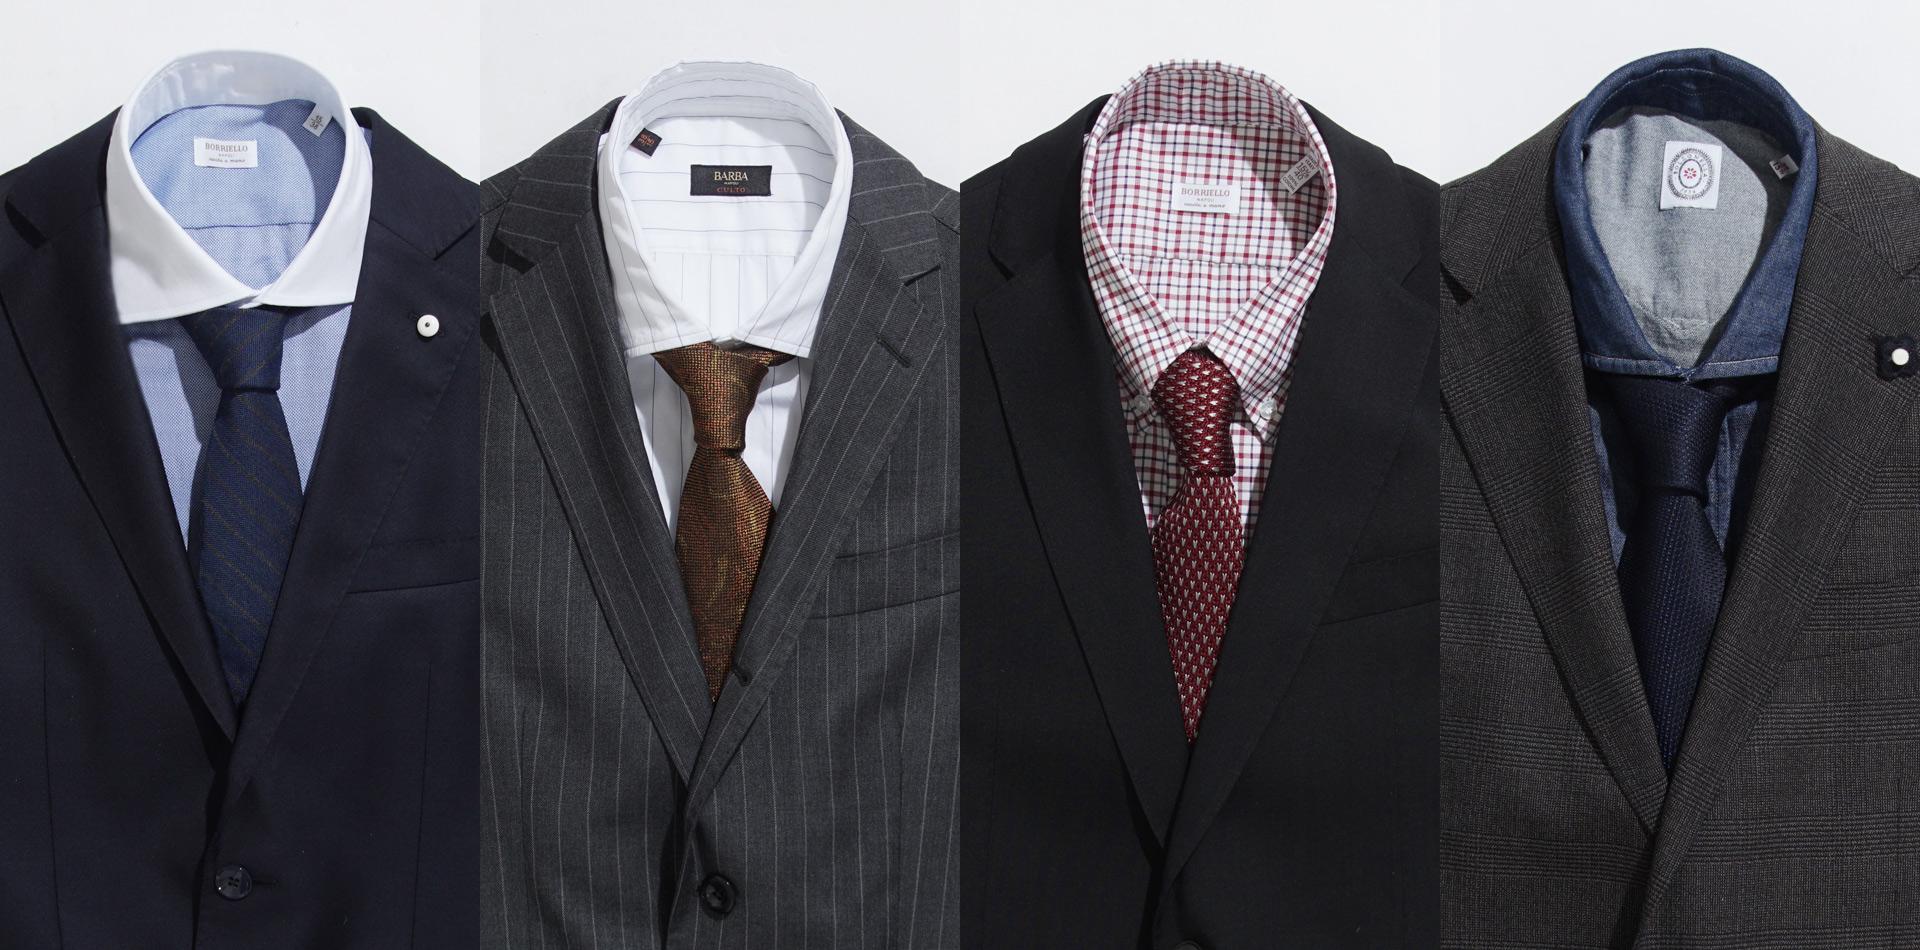 f3b9eea380c2 これであなたもデキル男。スーツとシャツ・ネクタイの絶対相性! ~コーデ篇~    モダンブルー